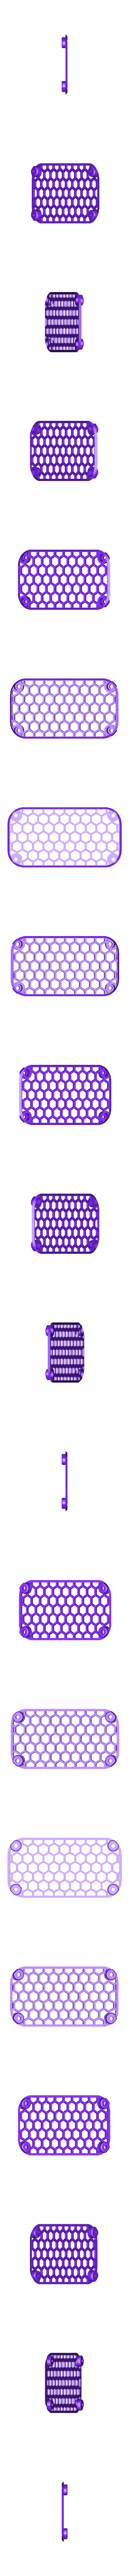 Front_mesh1.stl Download free STL file Mini Bluetooth Speaker • 3D printer design, EugenioFructuoso